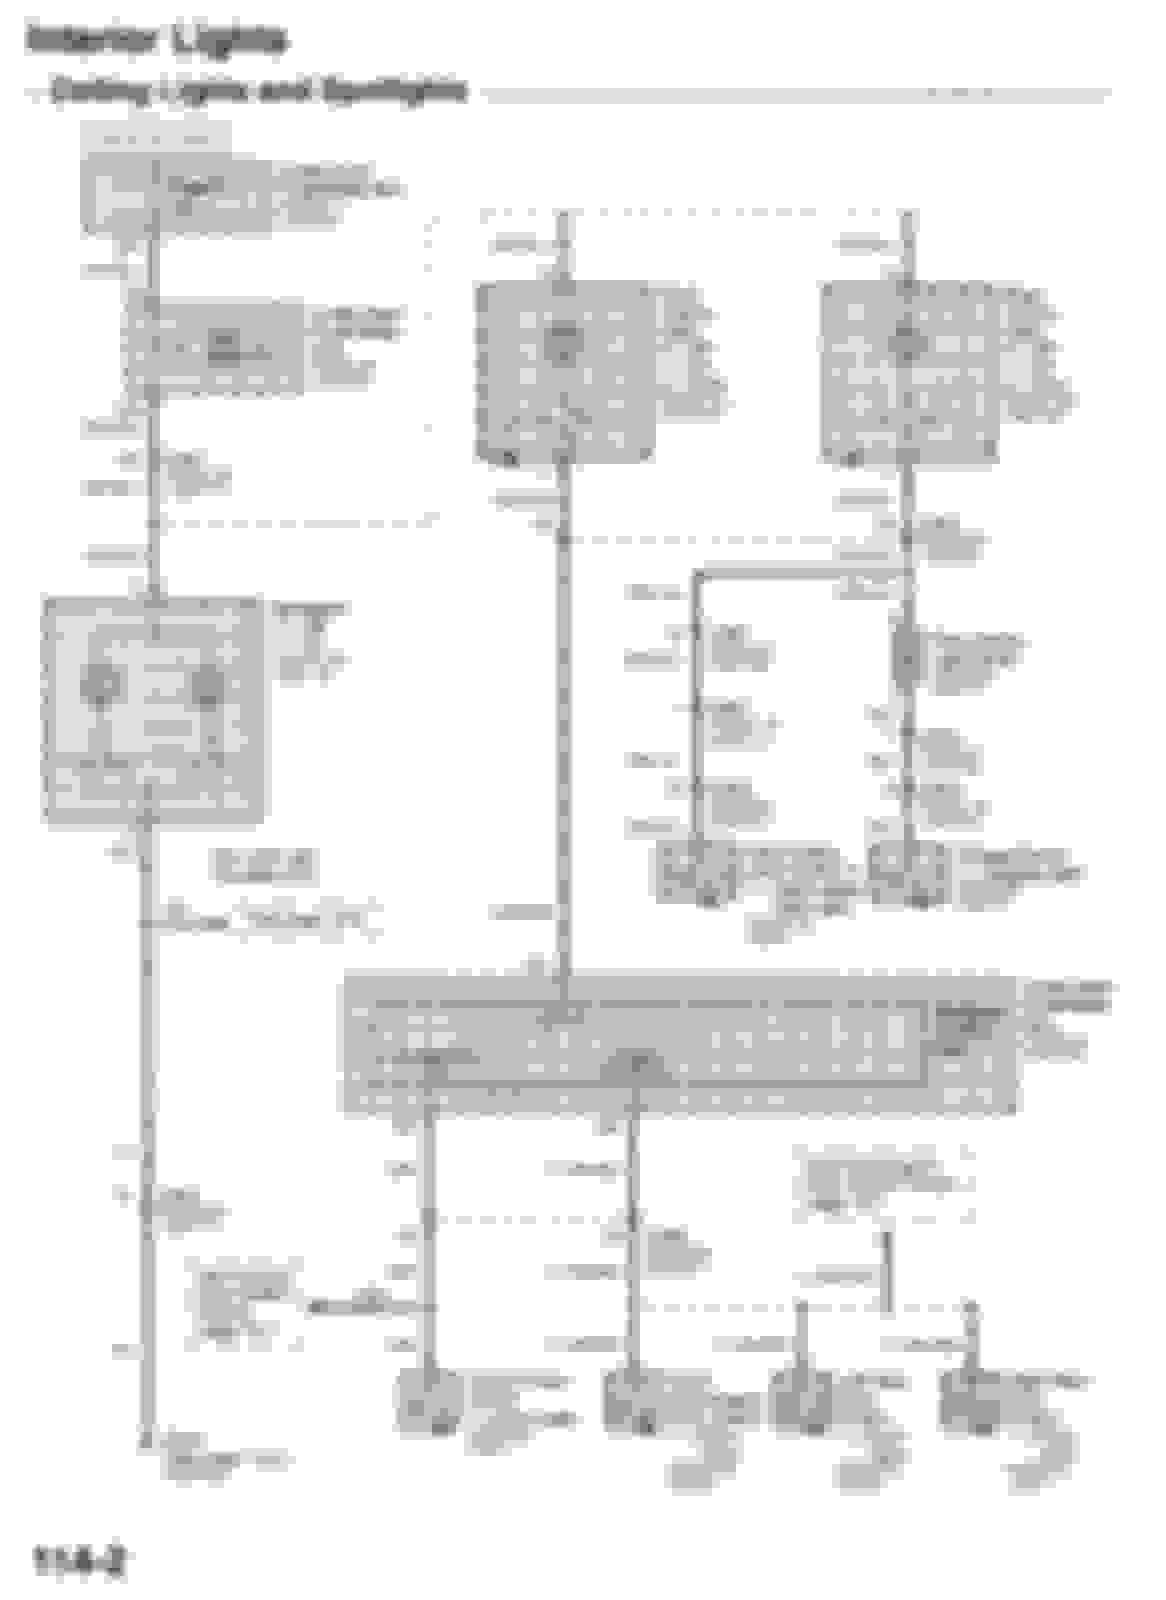 2006 Honda Accord Dome Light Wiring - Cars Wiring Diagram